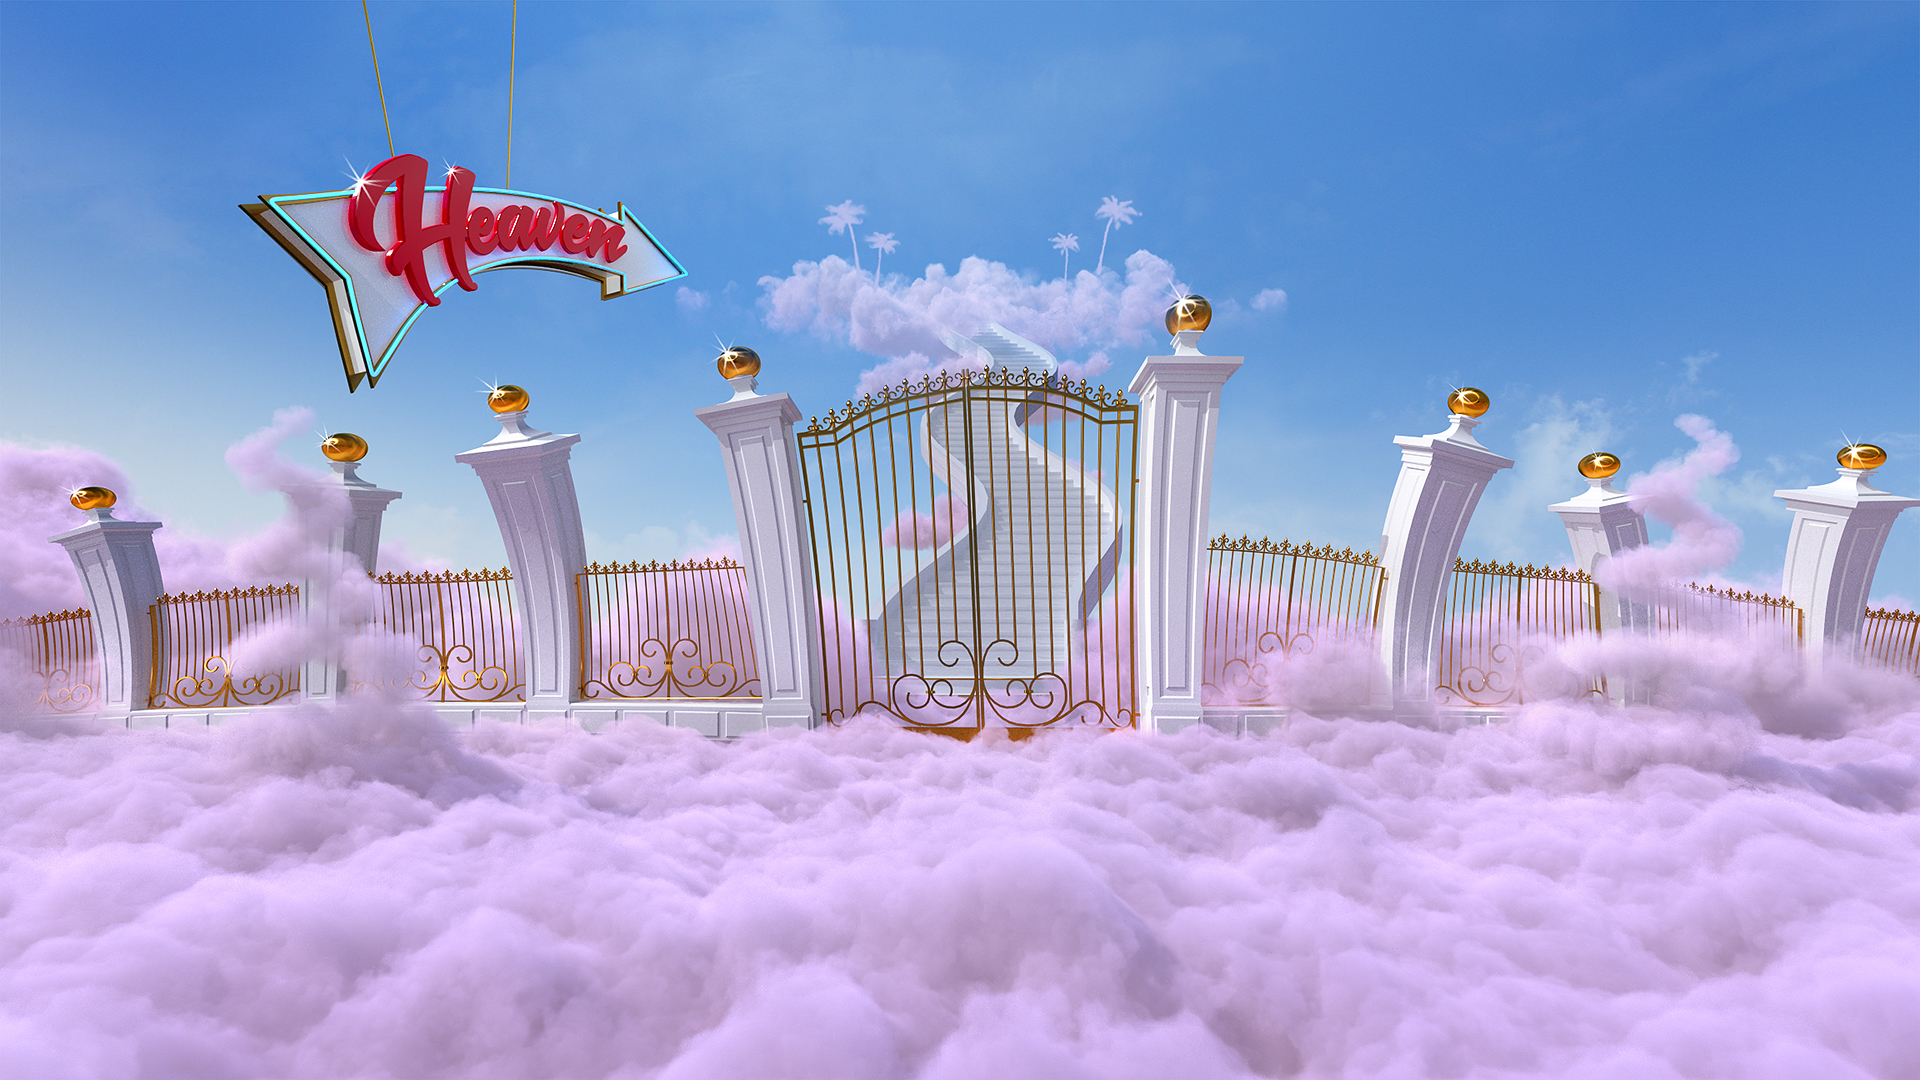 gates_of_heaven_dmp_wip_006